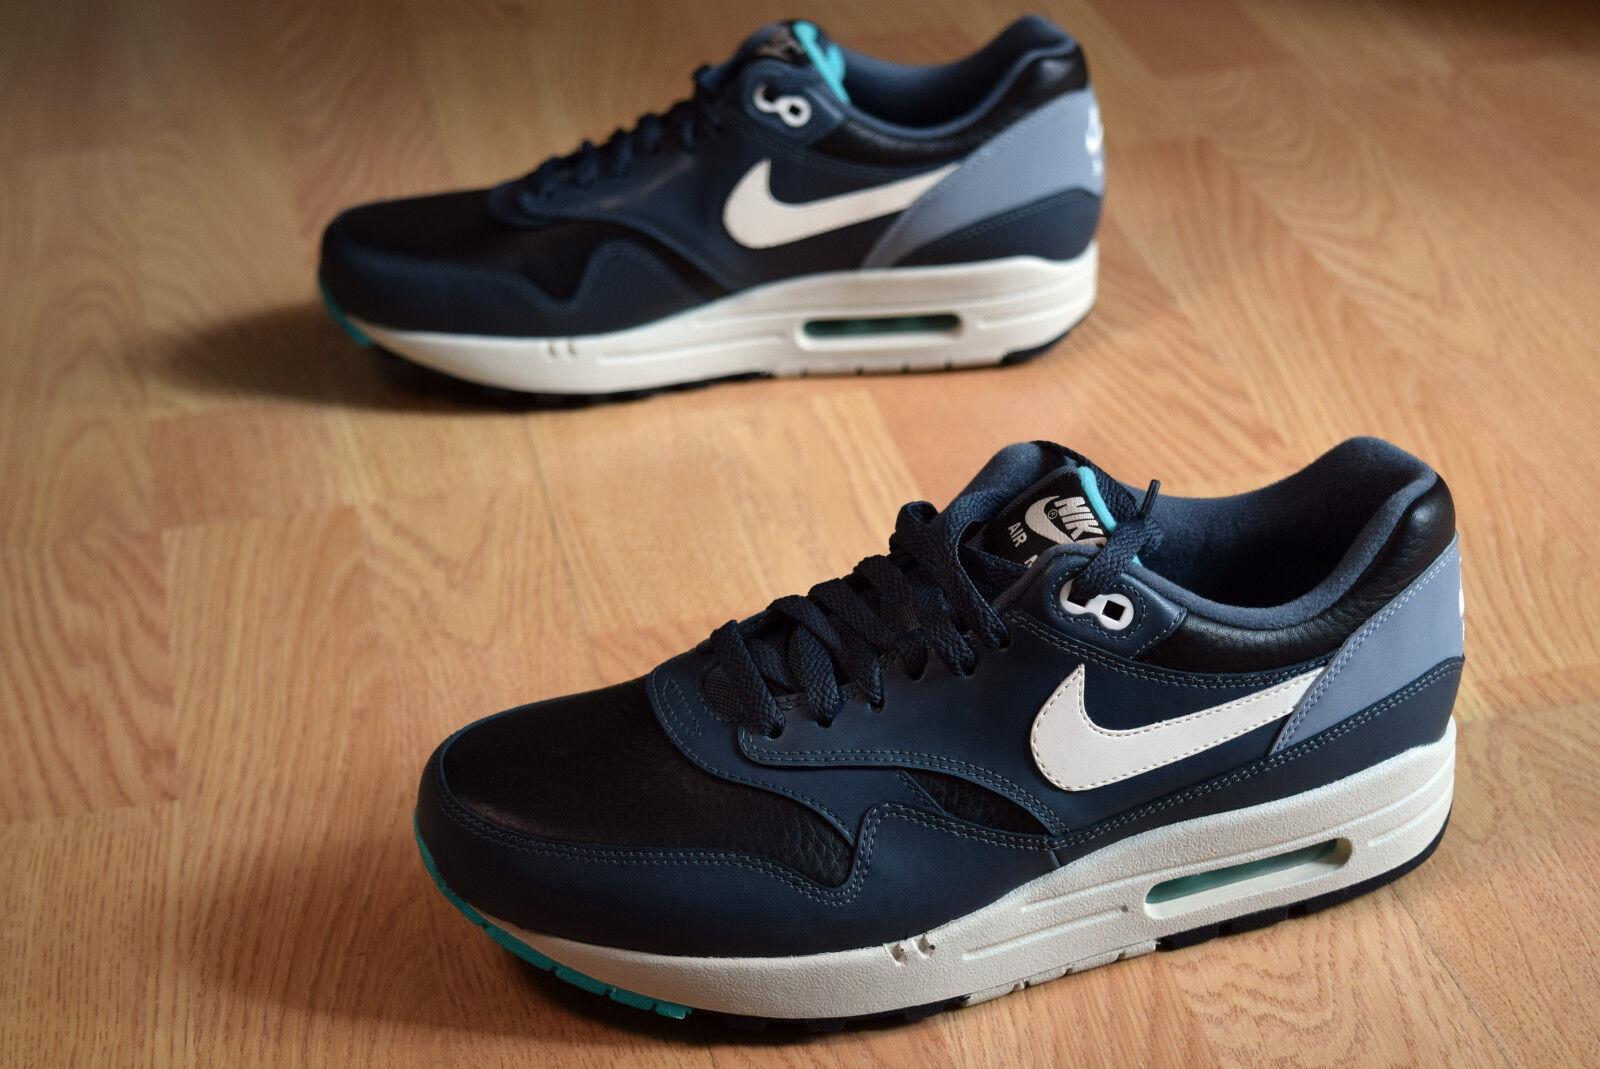 Nike Air Max 1 LTR  41 42 classic 90 bw fReE pEGaSuS LiGhT rOsHe rUn 654466 002